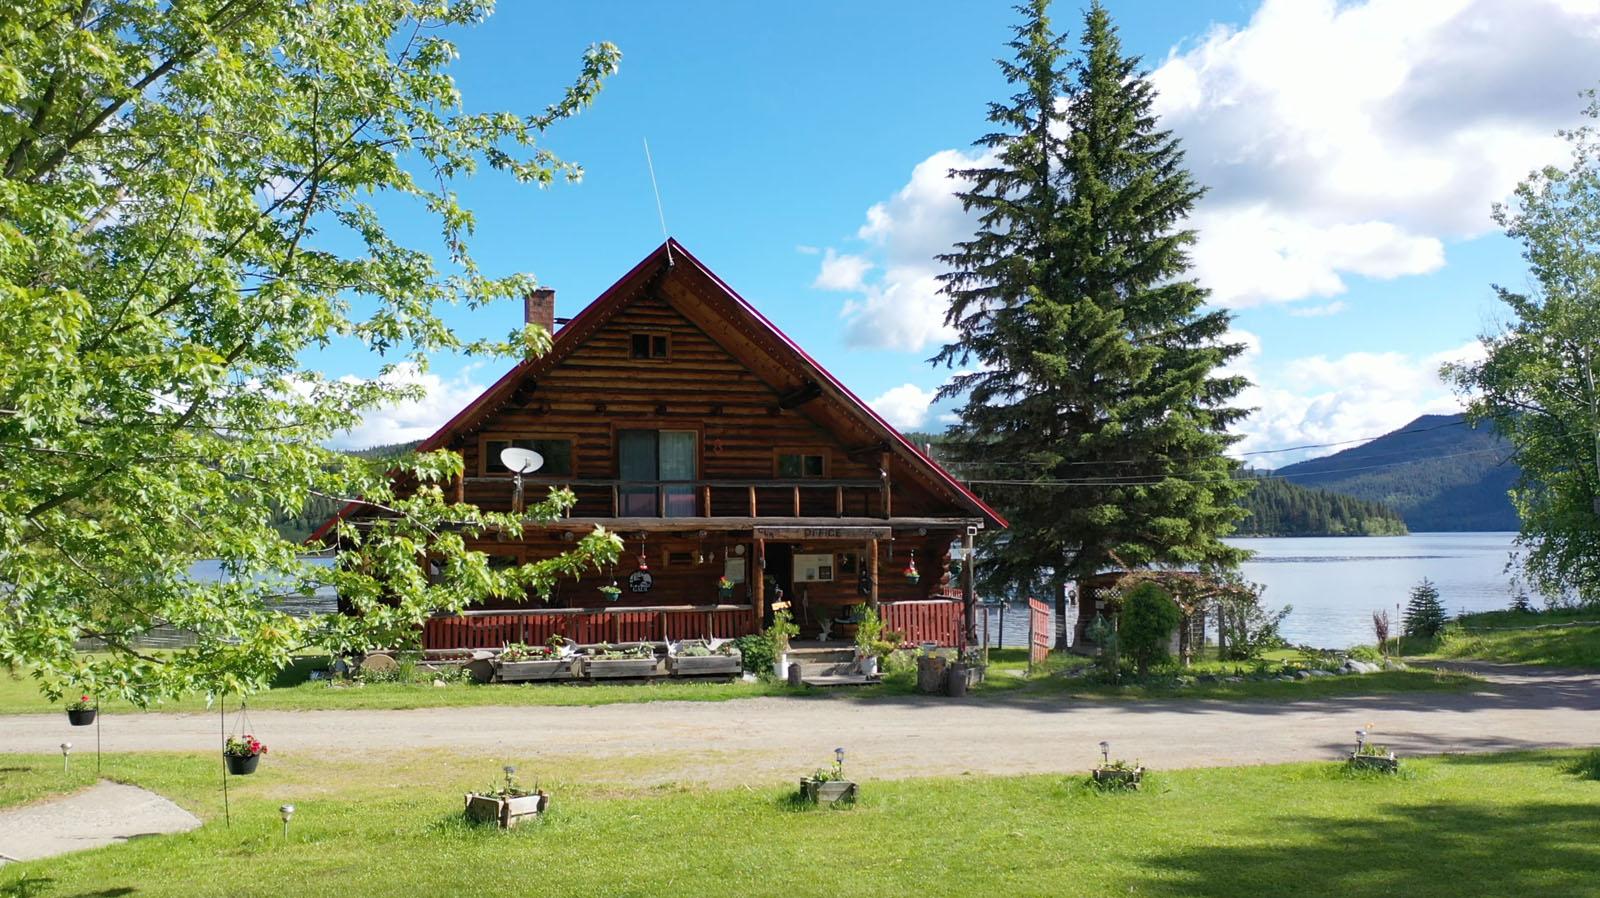 Canim lake resort 28